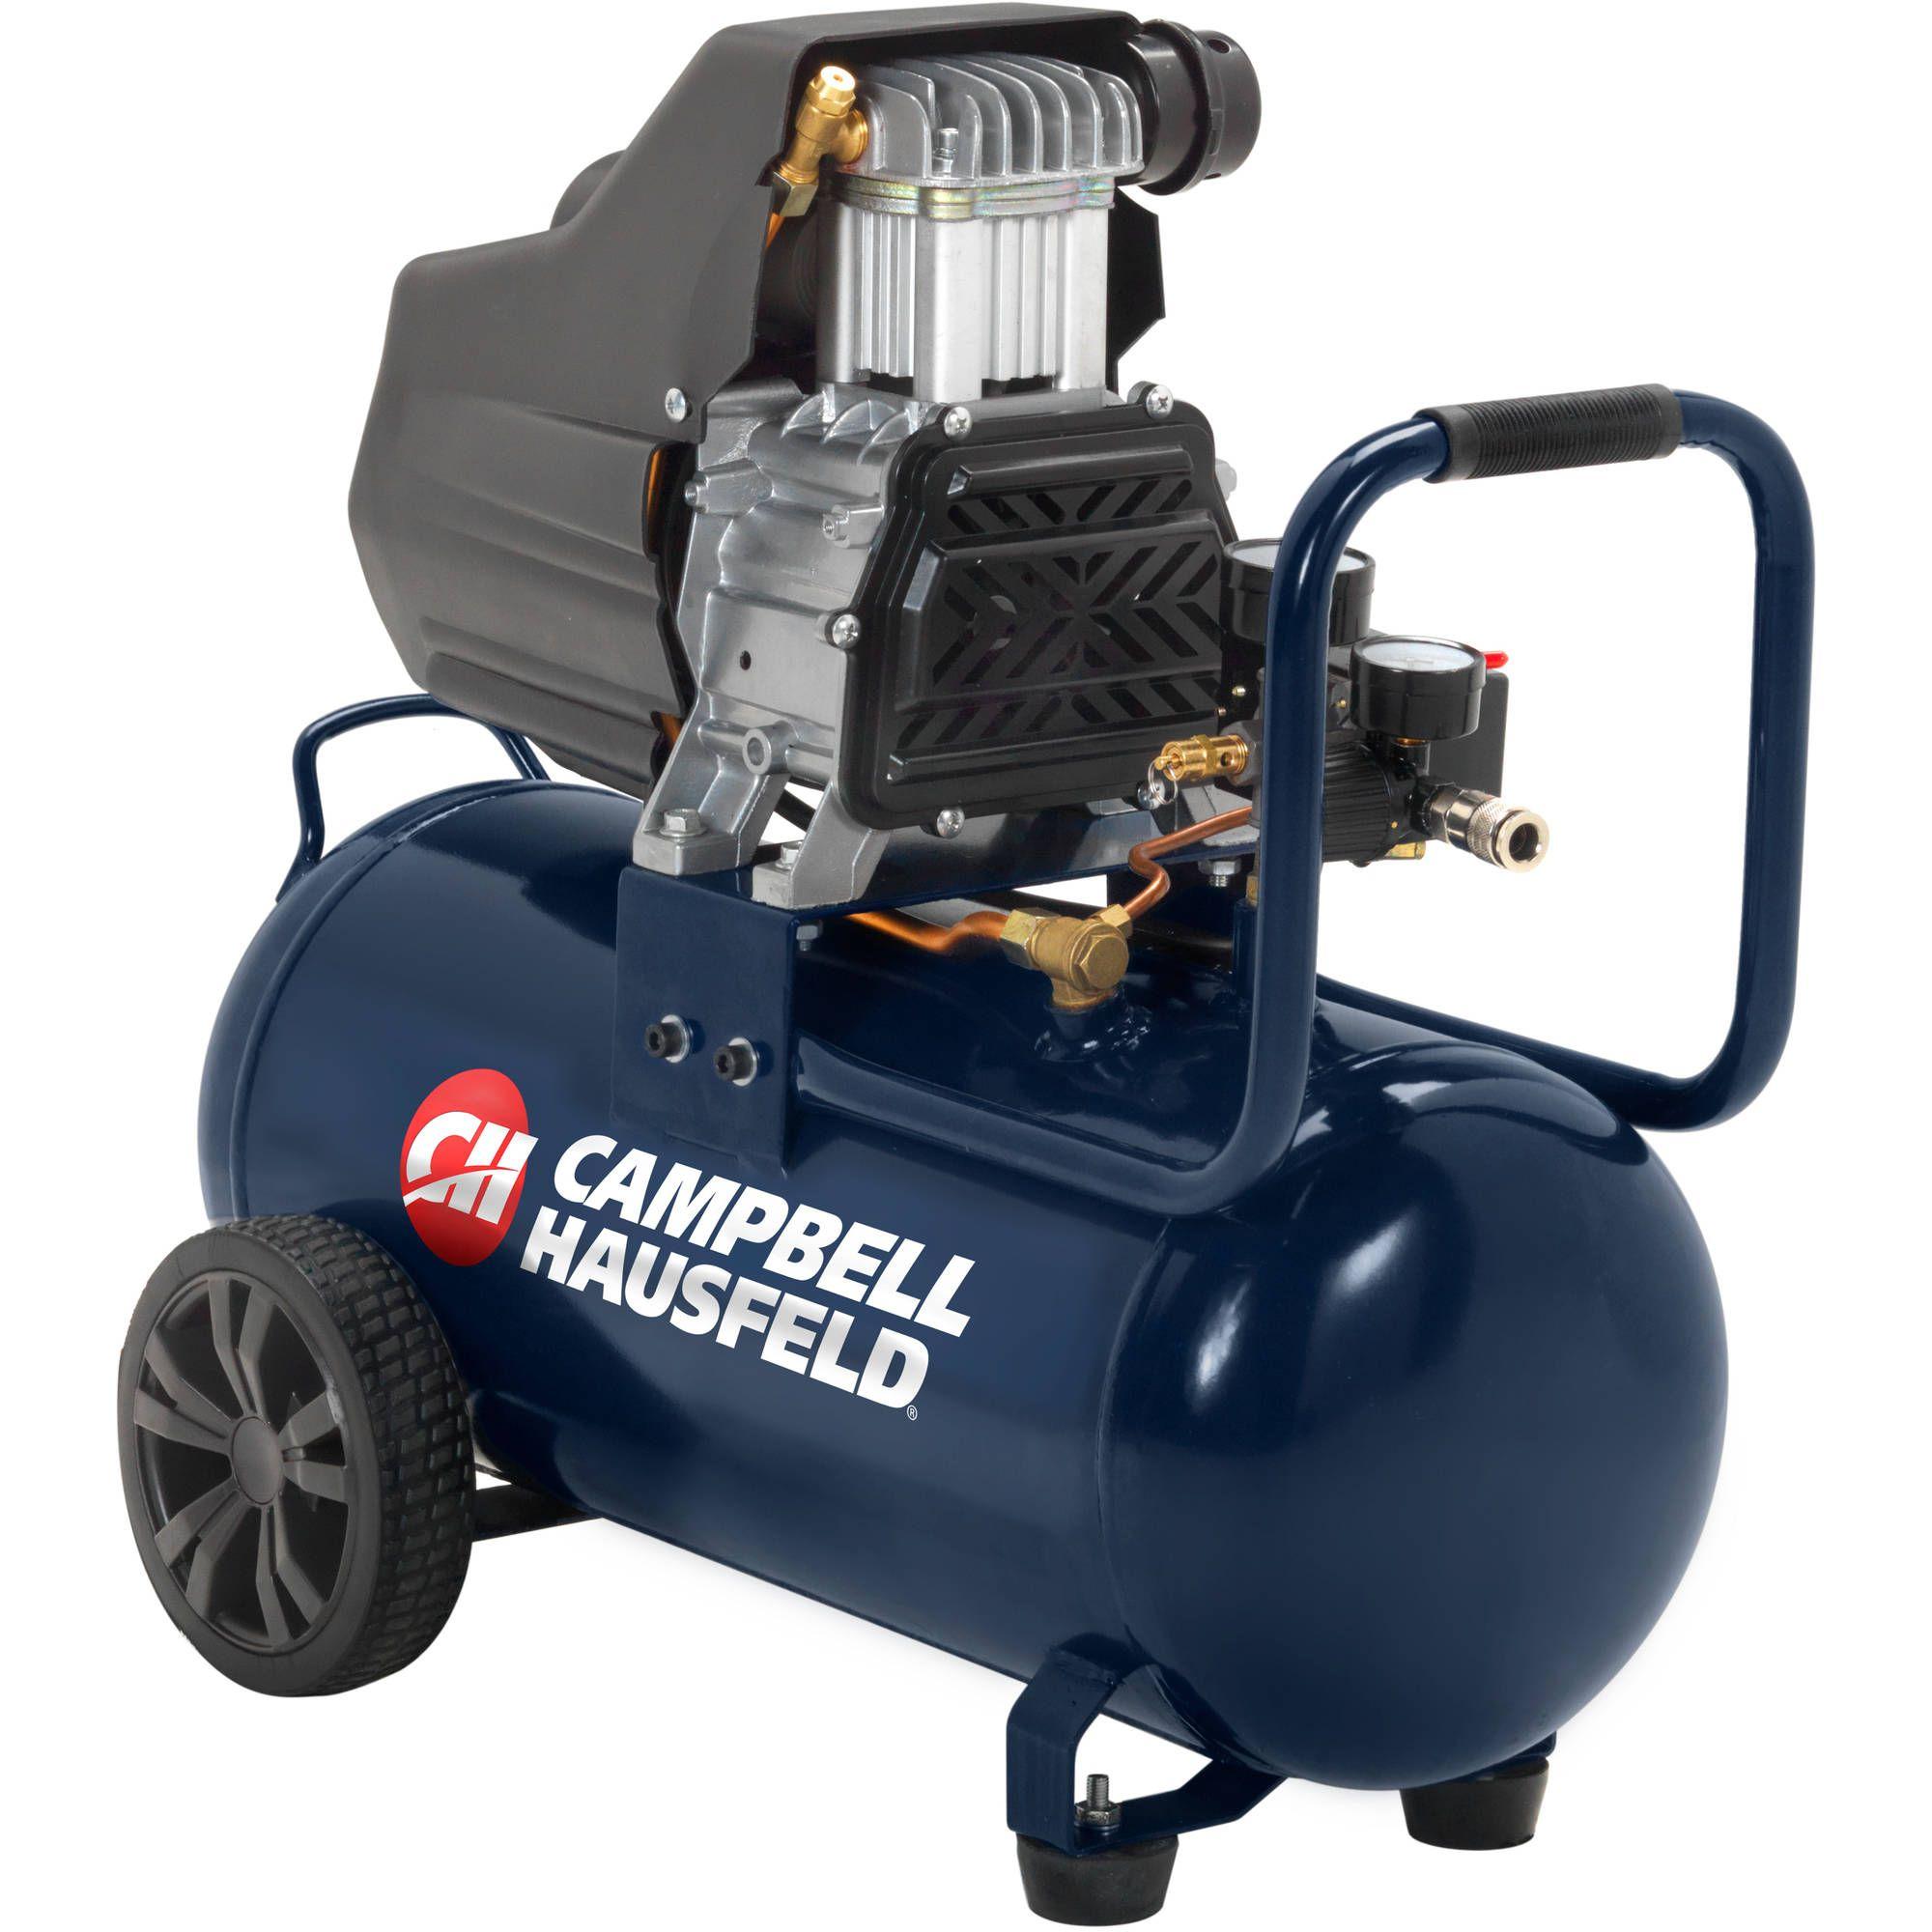 Campbell Hausfeld Air Compressor 8 Gallon OilFree